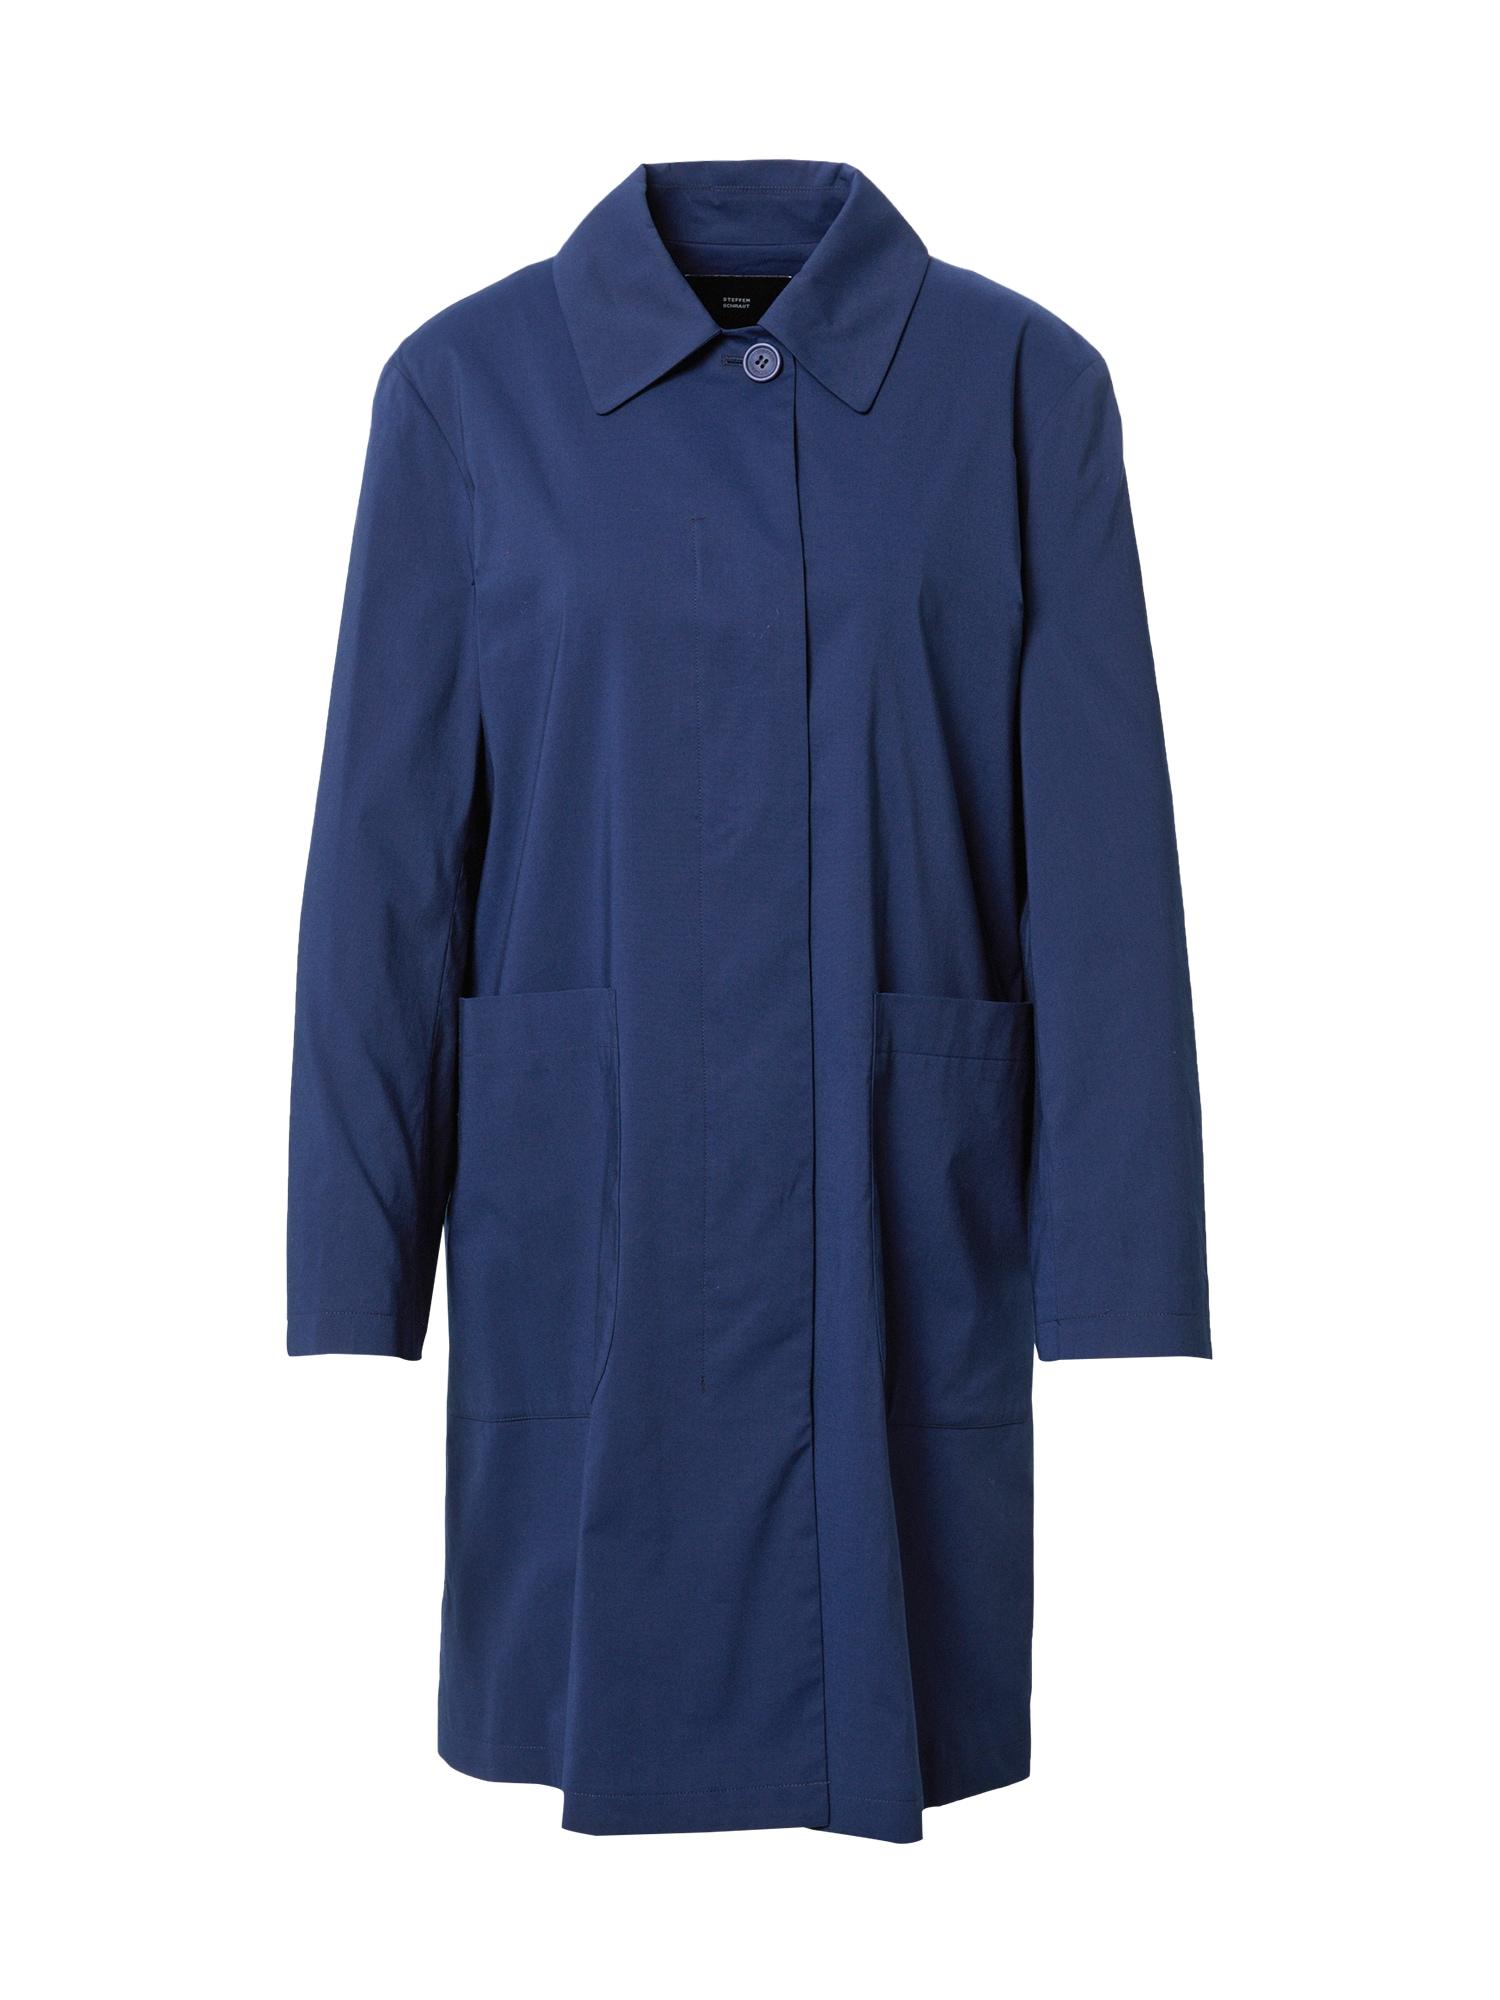 STEFFEN SCHRAUT Demisezoninis paltas tamsiai mėlyna